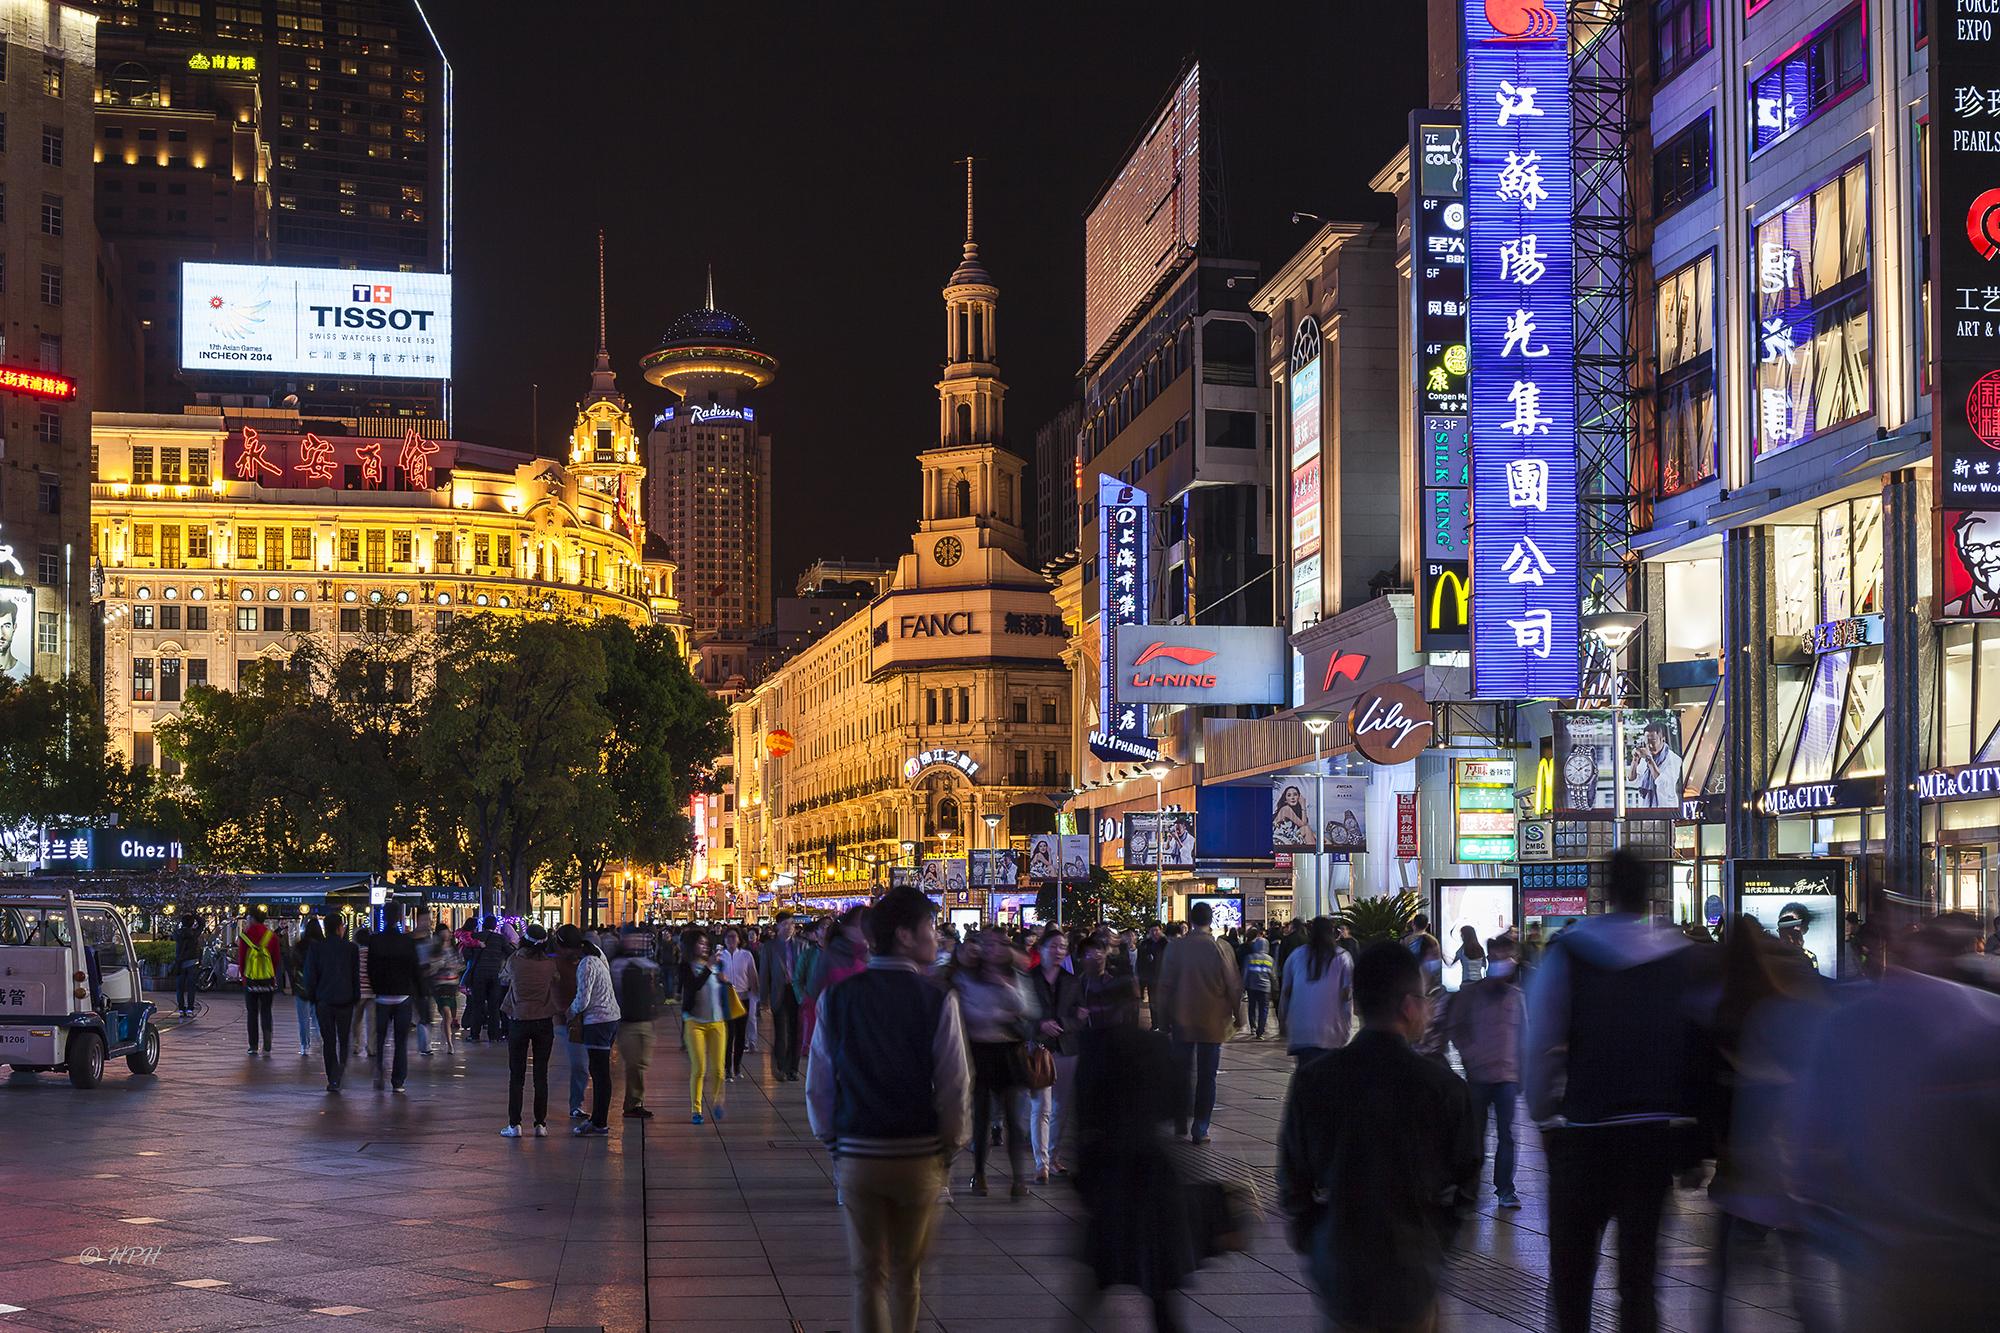 Nanjing lu, Shanghai, China